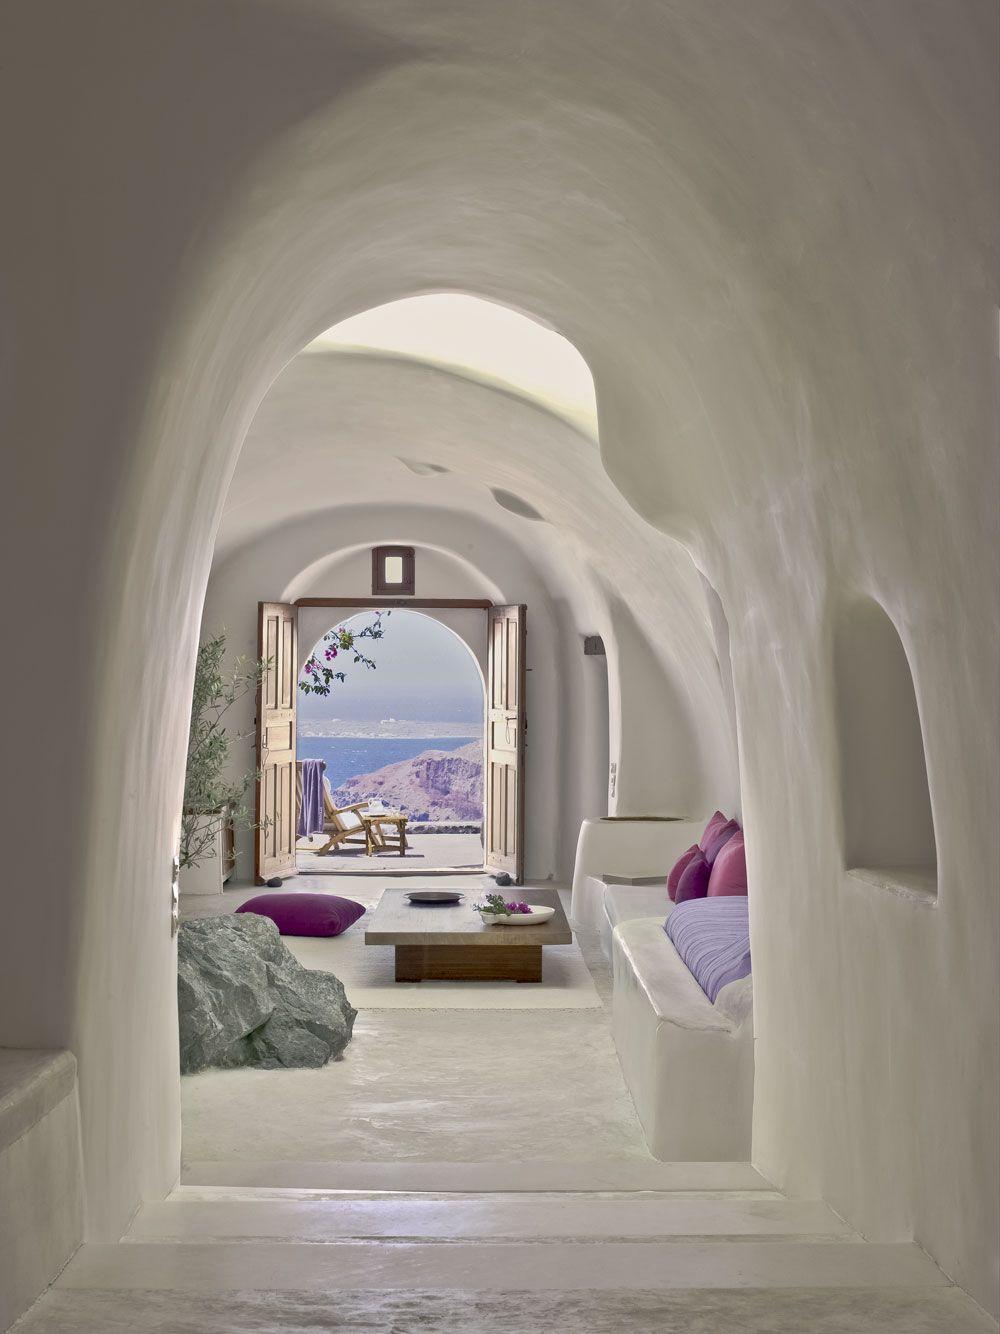 Perivolas Hotel in Santorini, Greece